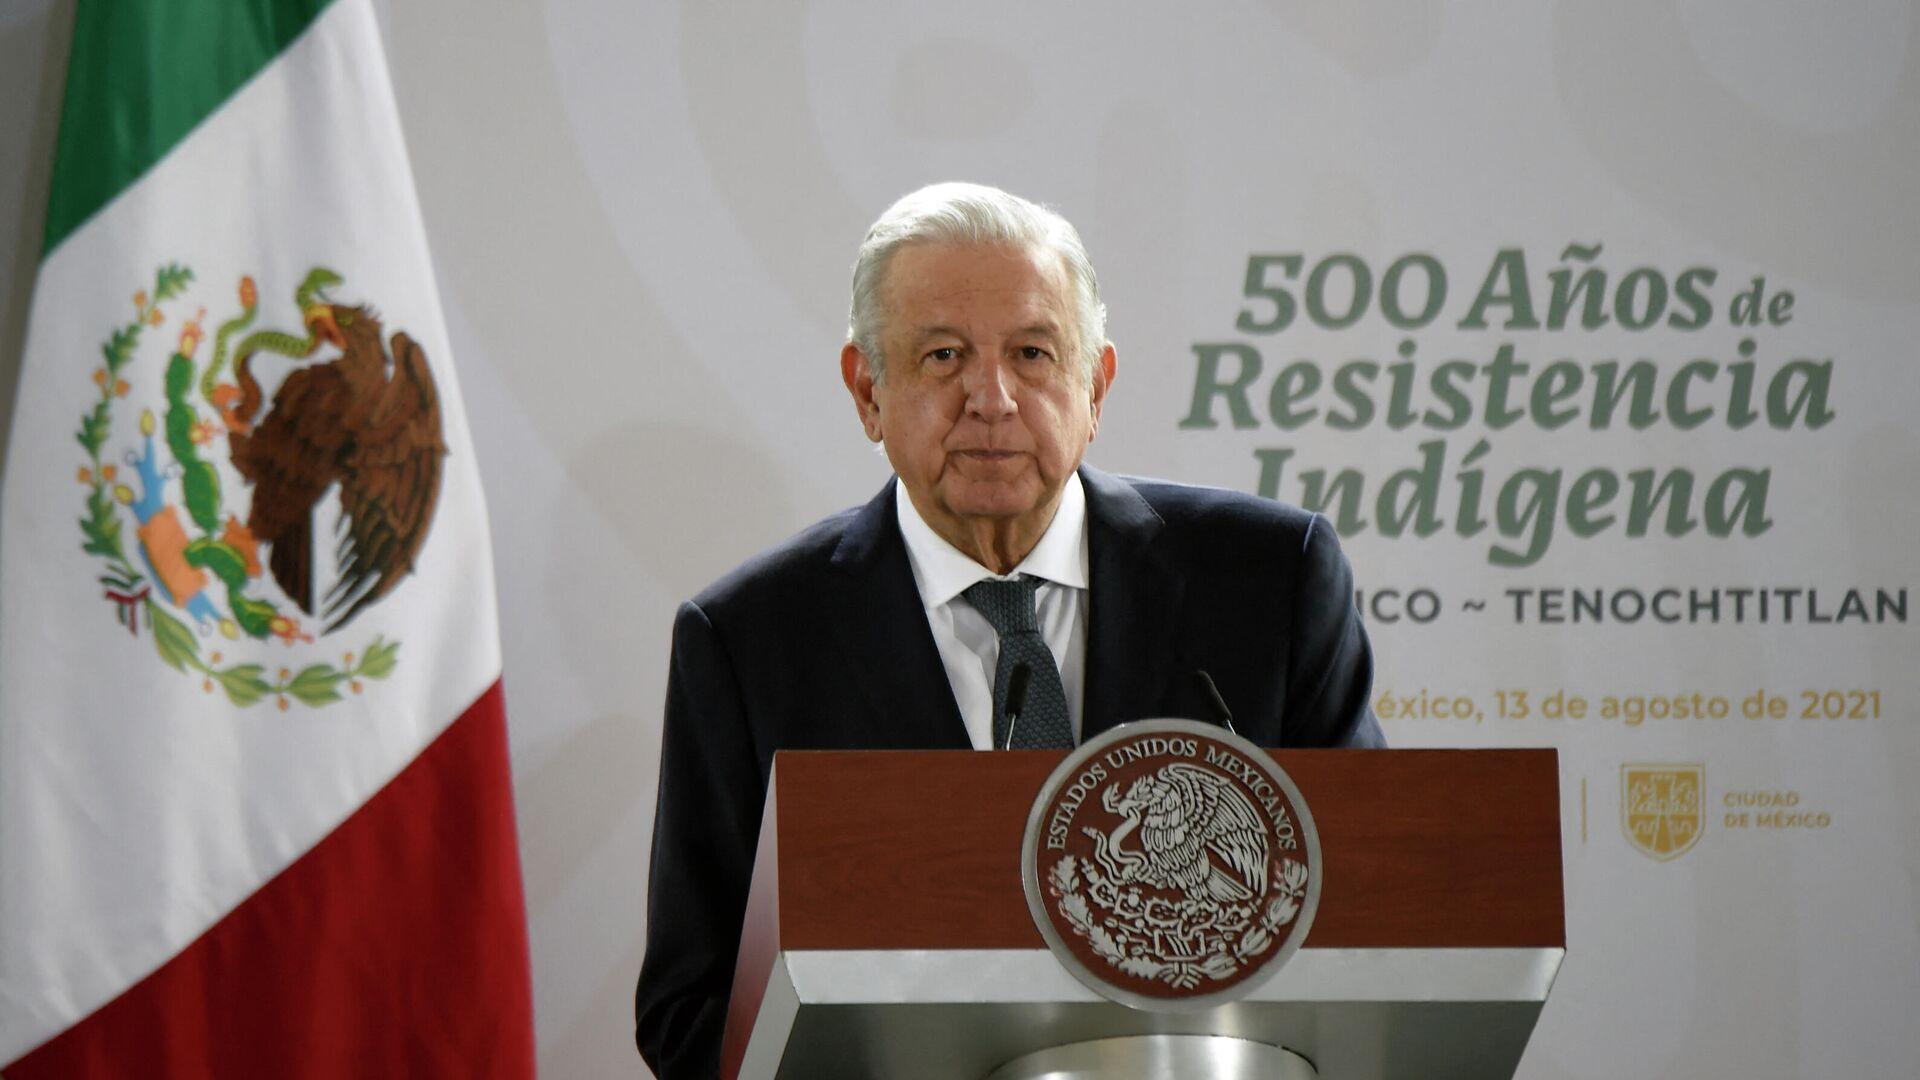 El presidente de México, Andrés Manuel López Obrador - Sputnik Mundo, 1920, 13.08.2021